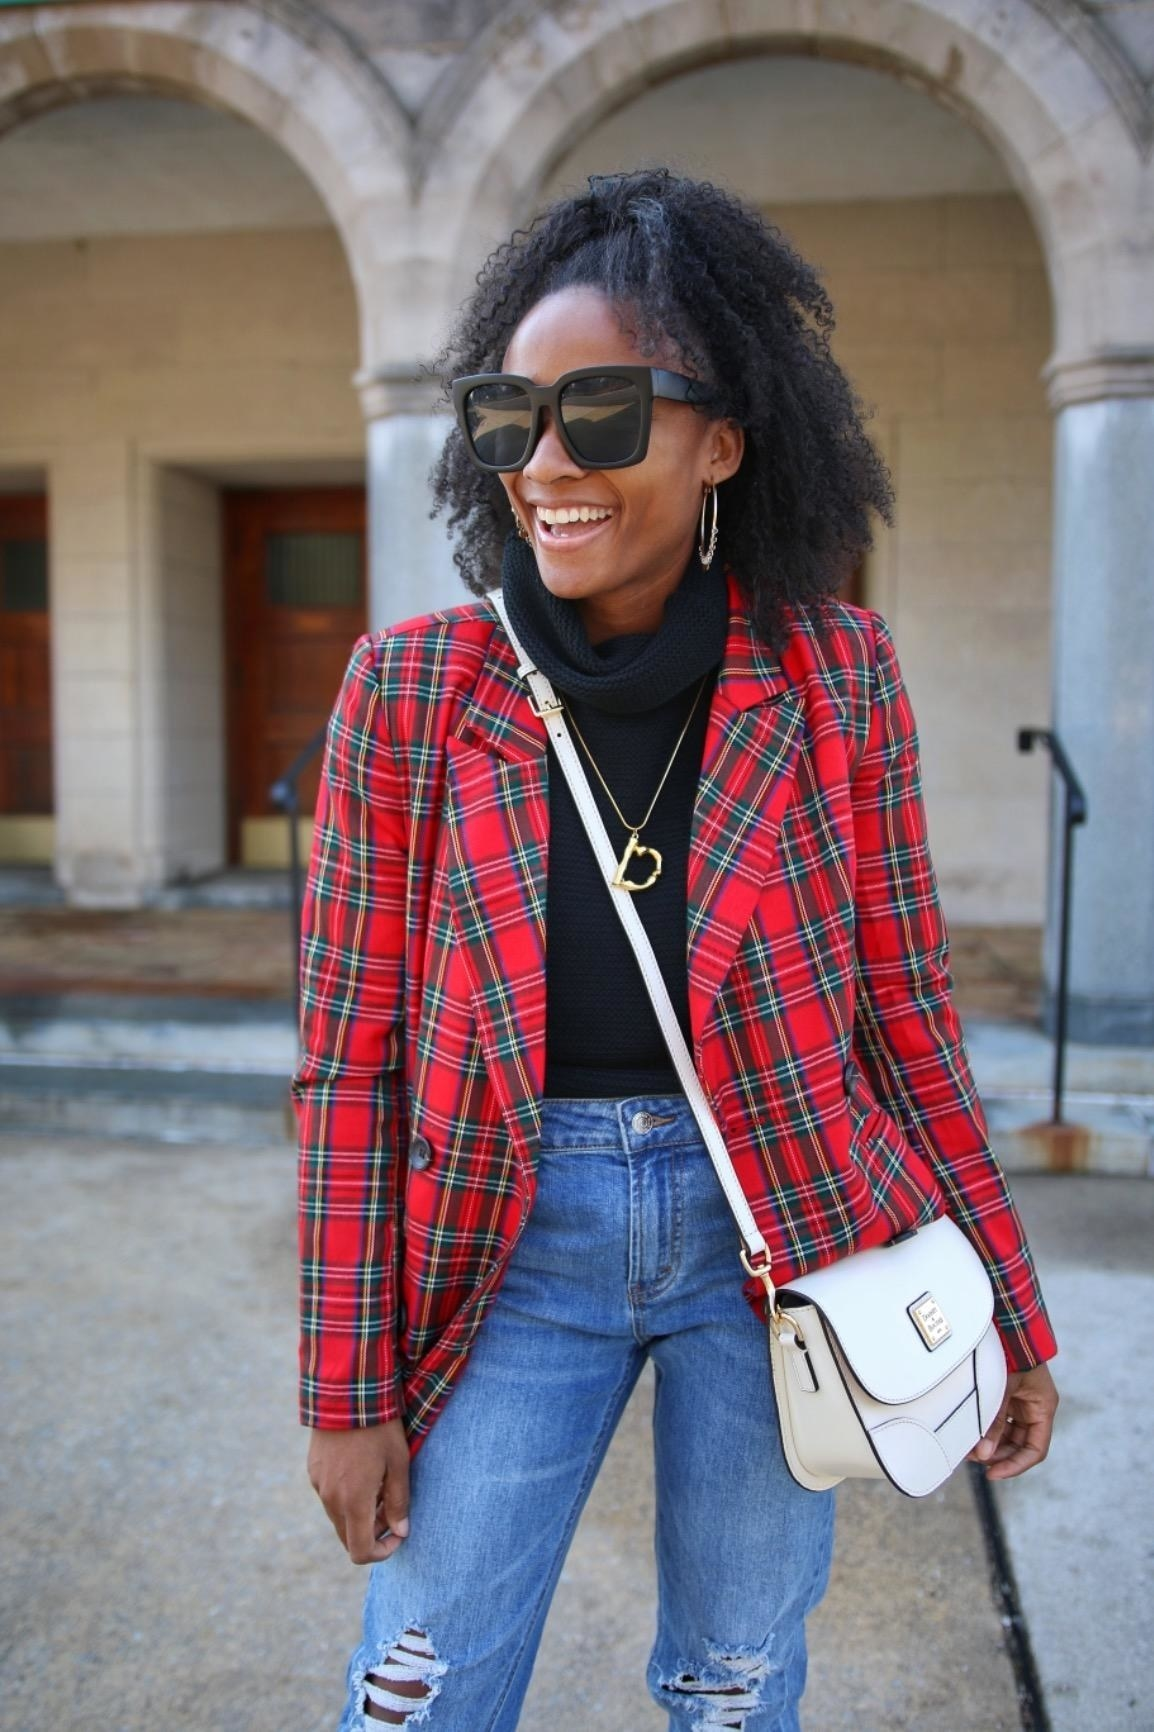 Reviewer wearing the red tartan style blazer